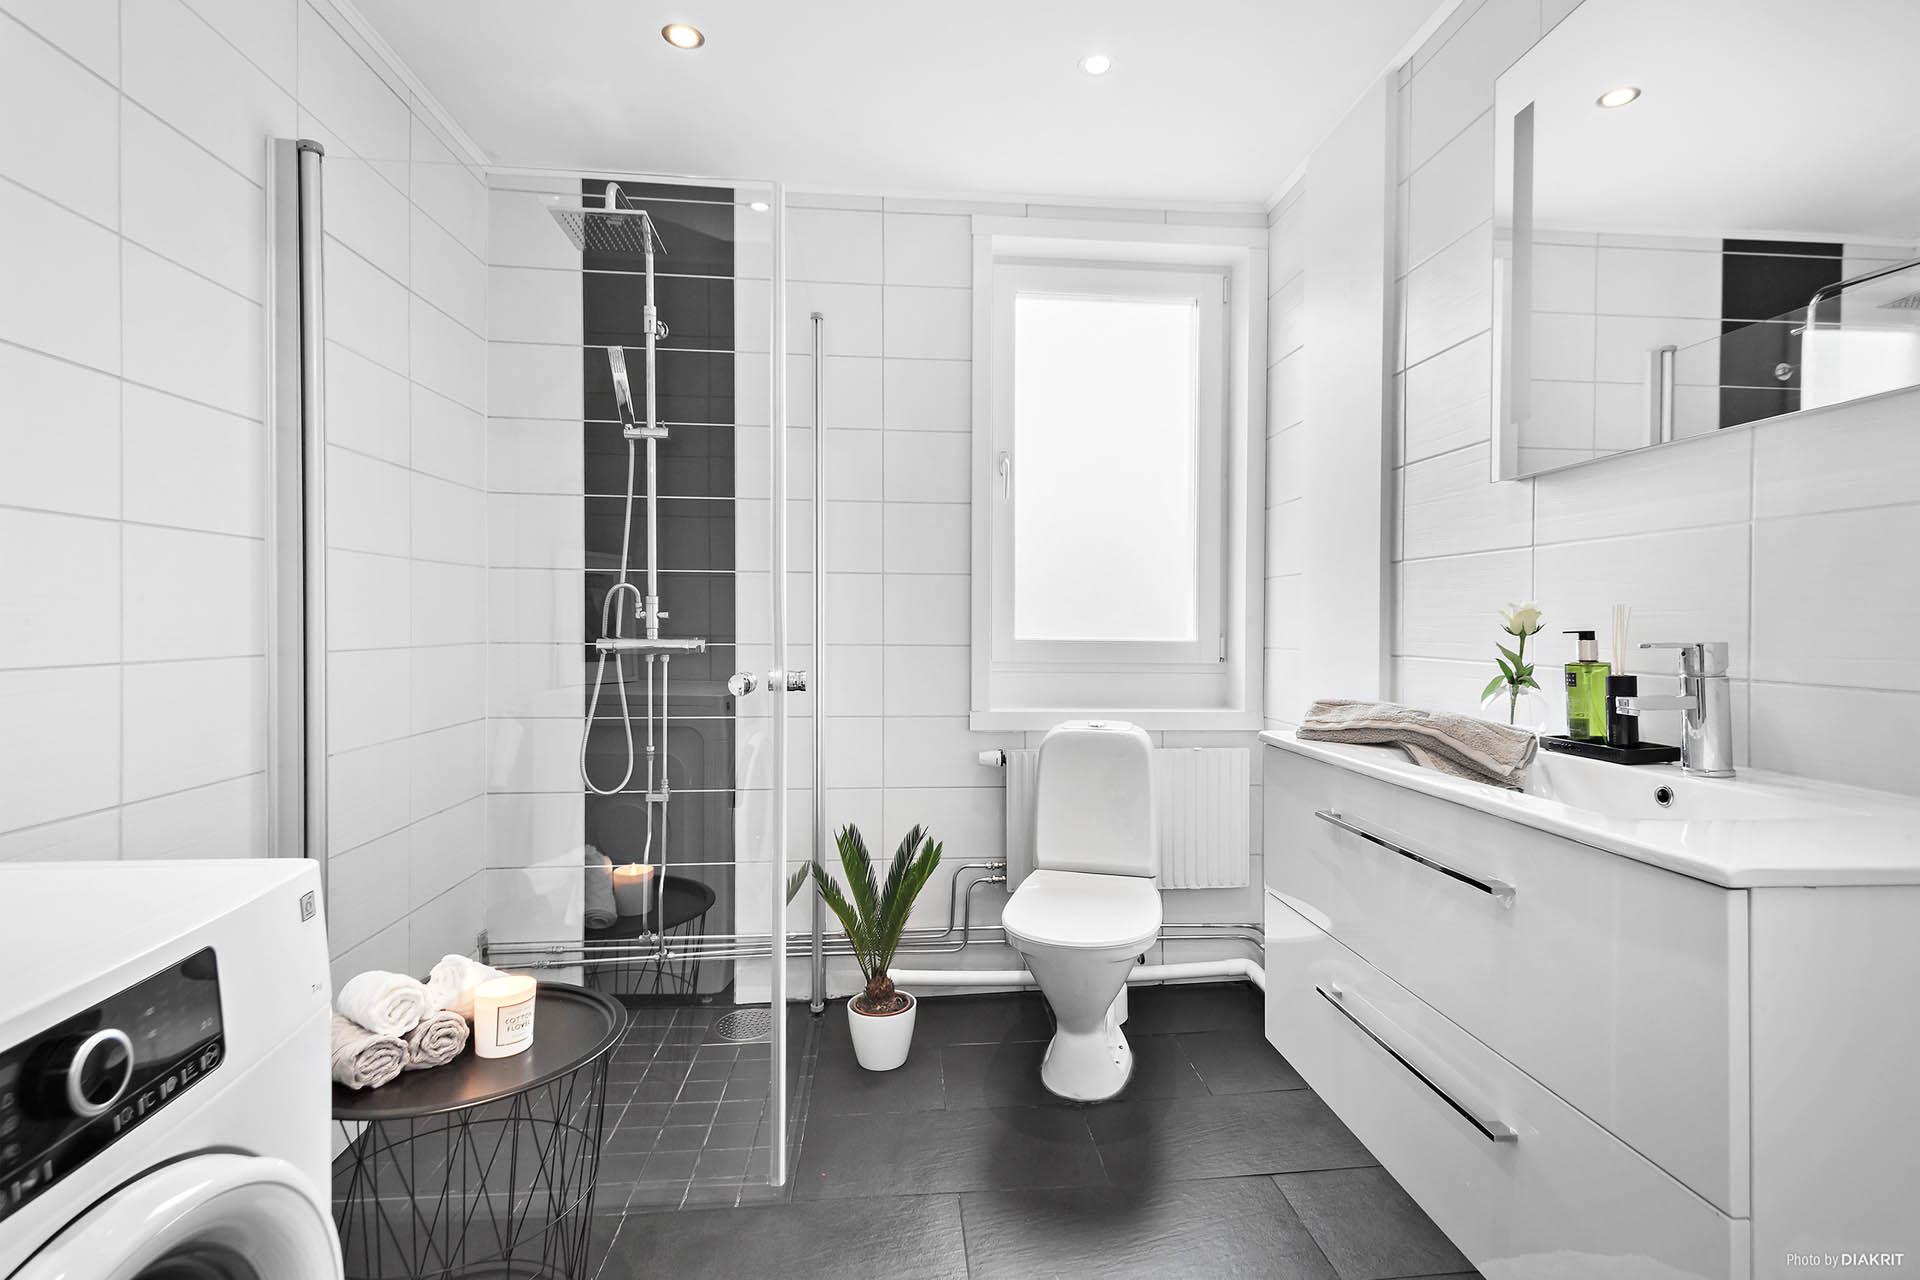 Helrenoverat badrum